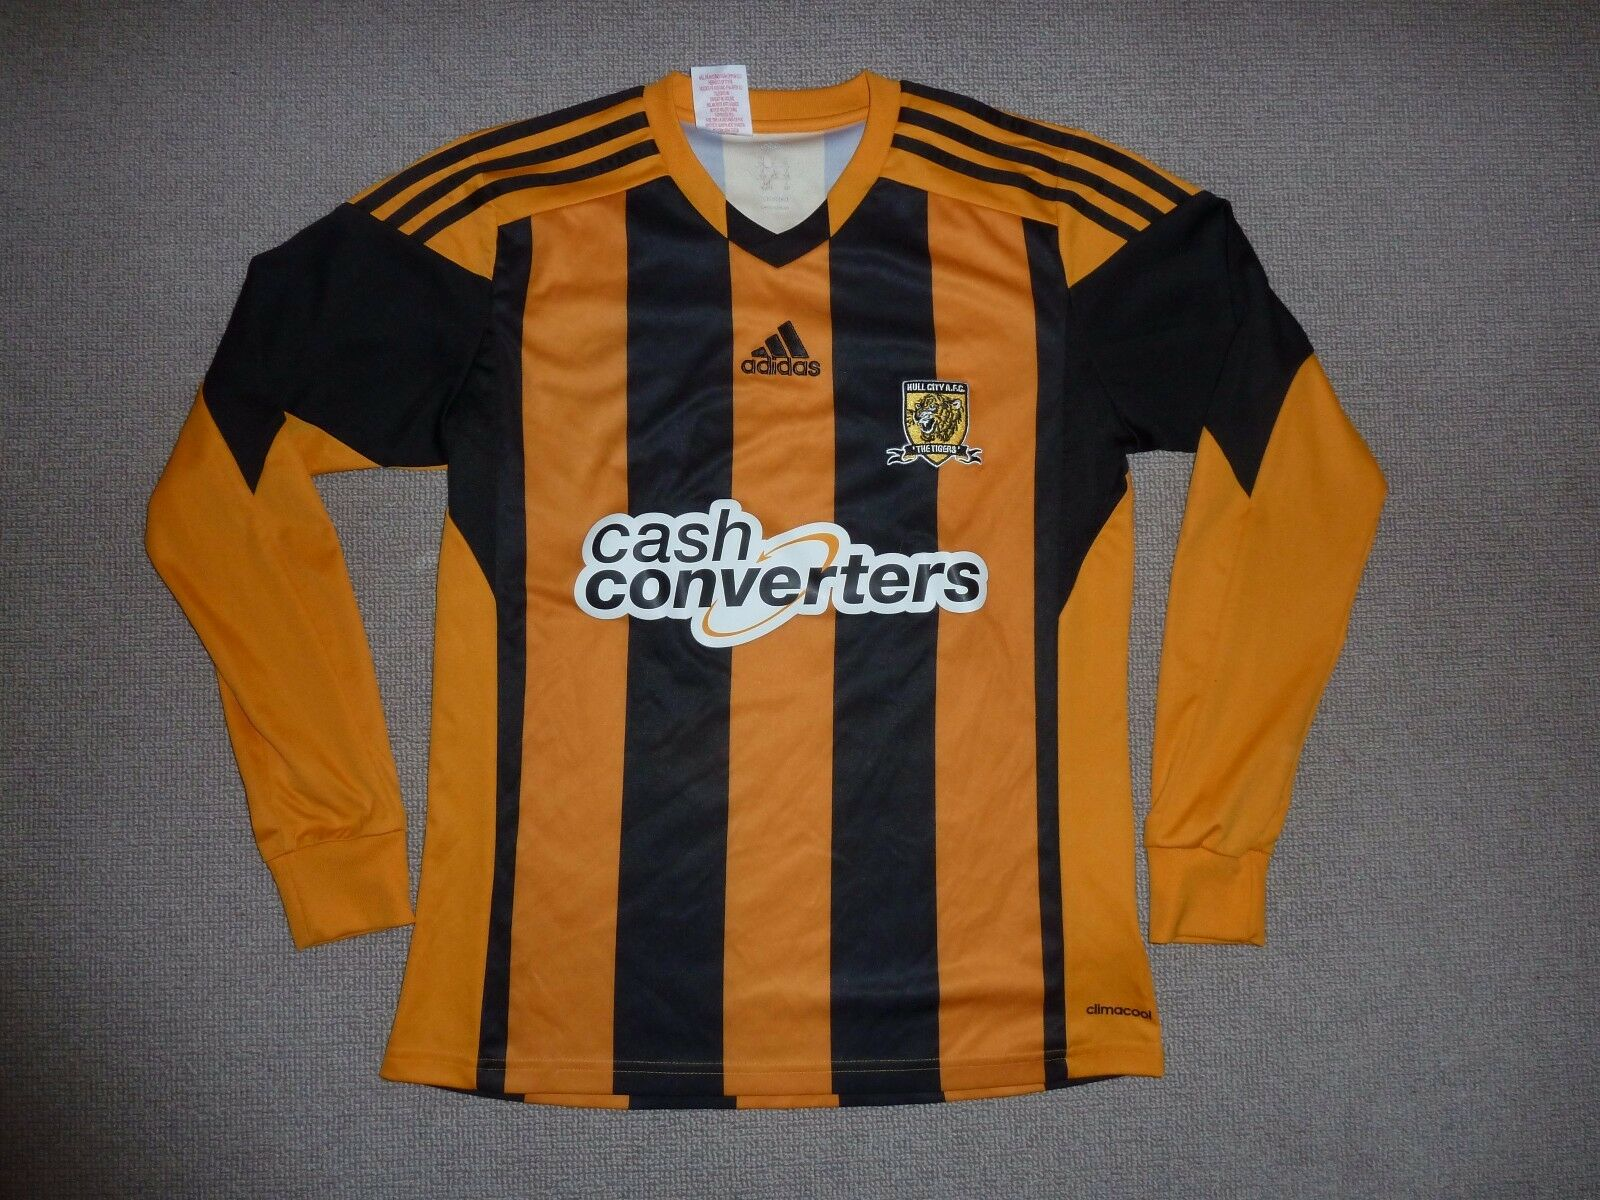 222925a69 HULL CITY football shirt XS soccer jersey YORKSHIRE away shirt maglia  maillot